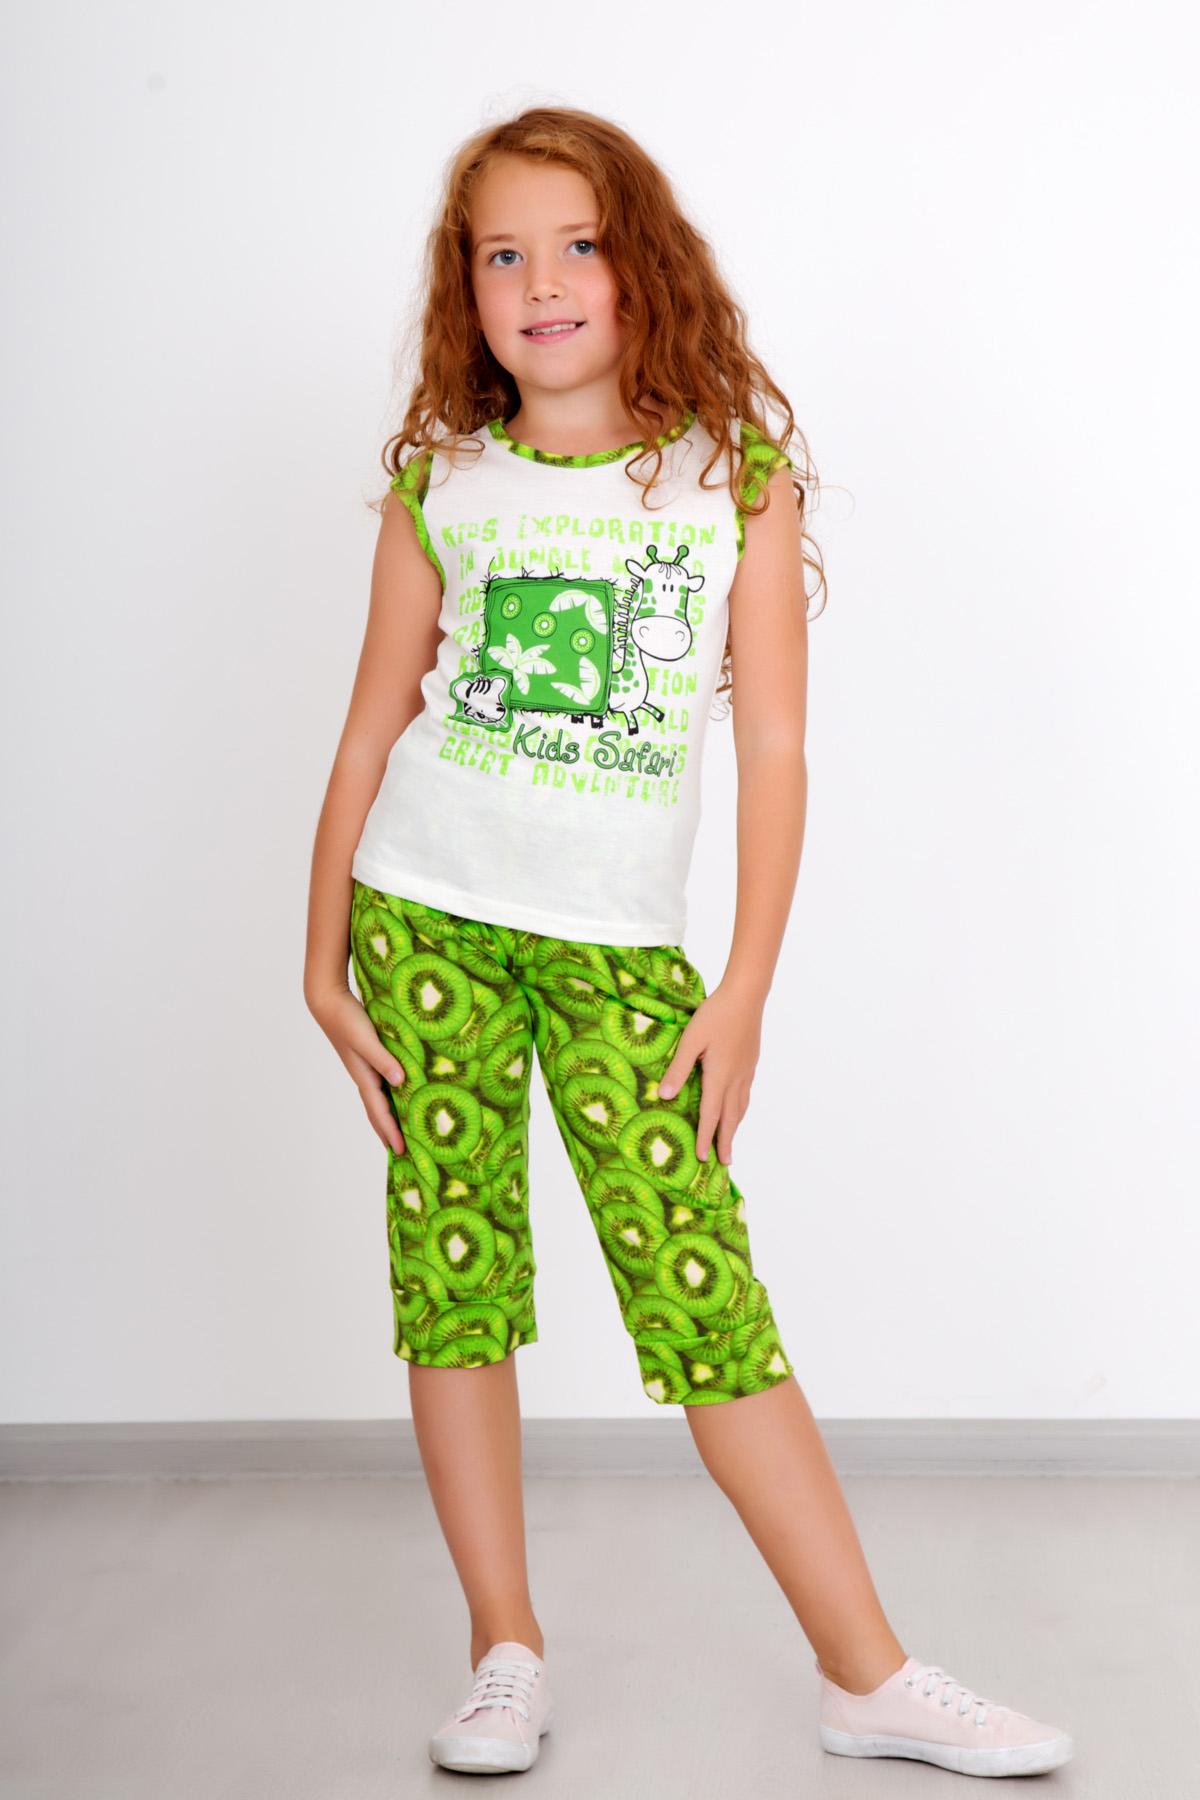 Дет. костюм Киви р. 30Костюмы<br><br><br>Тип: Дет. костюм<br>Размер: 30<br>Материал: Кулирка